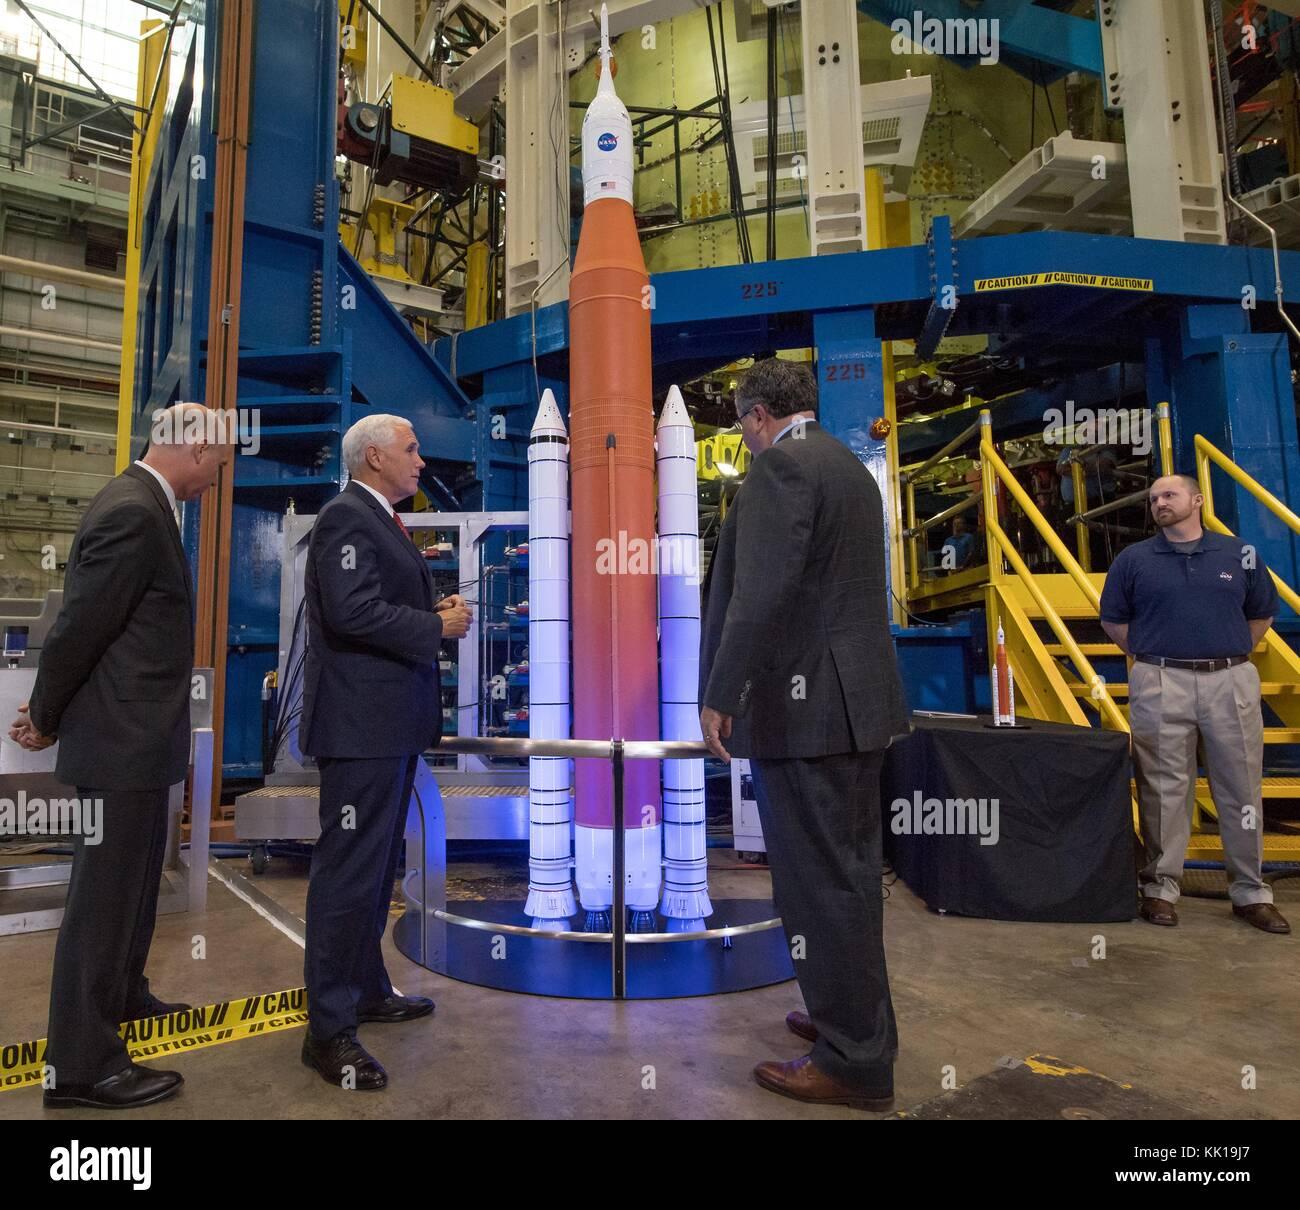 NASA Marshall Space Flight Center Director Todd May (right) gives U.S. Alabama Representative Robert Aderholt (left) - Stock Image